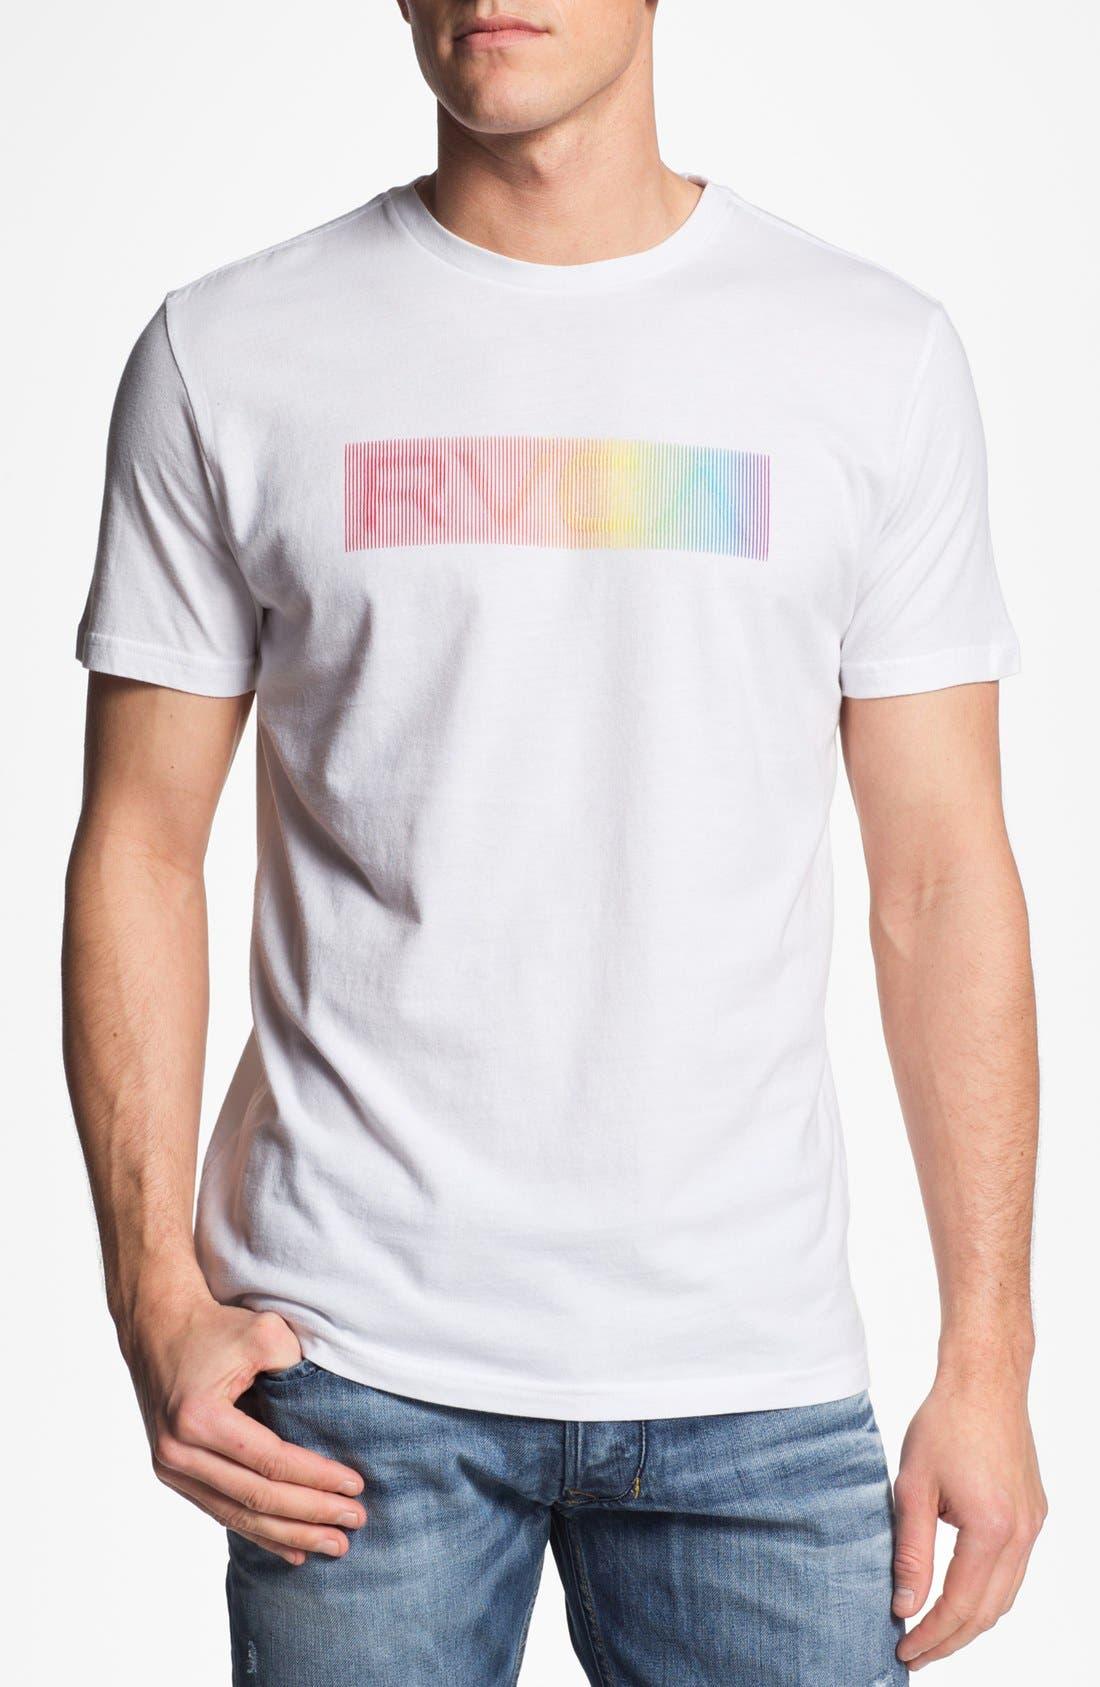 Main Image - RVCA 'Illusions' Graphic T-Shirt